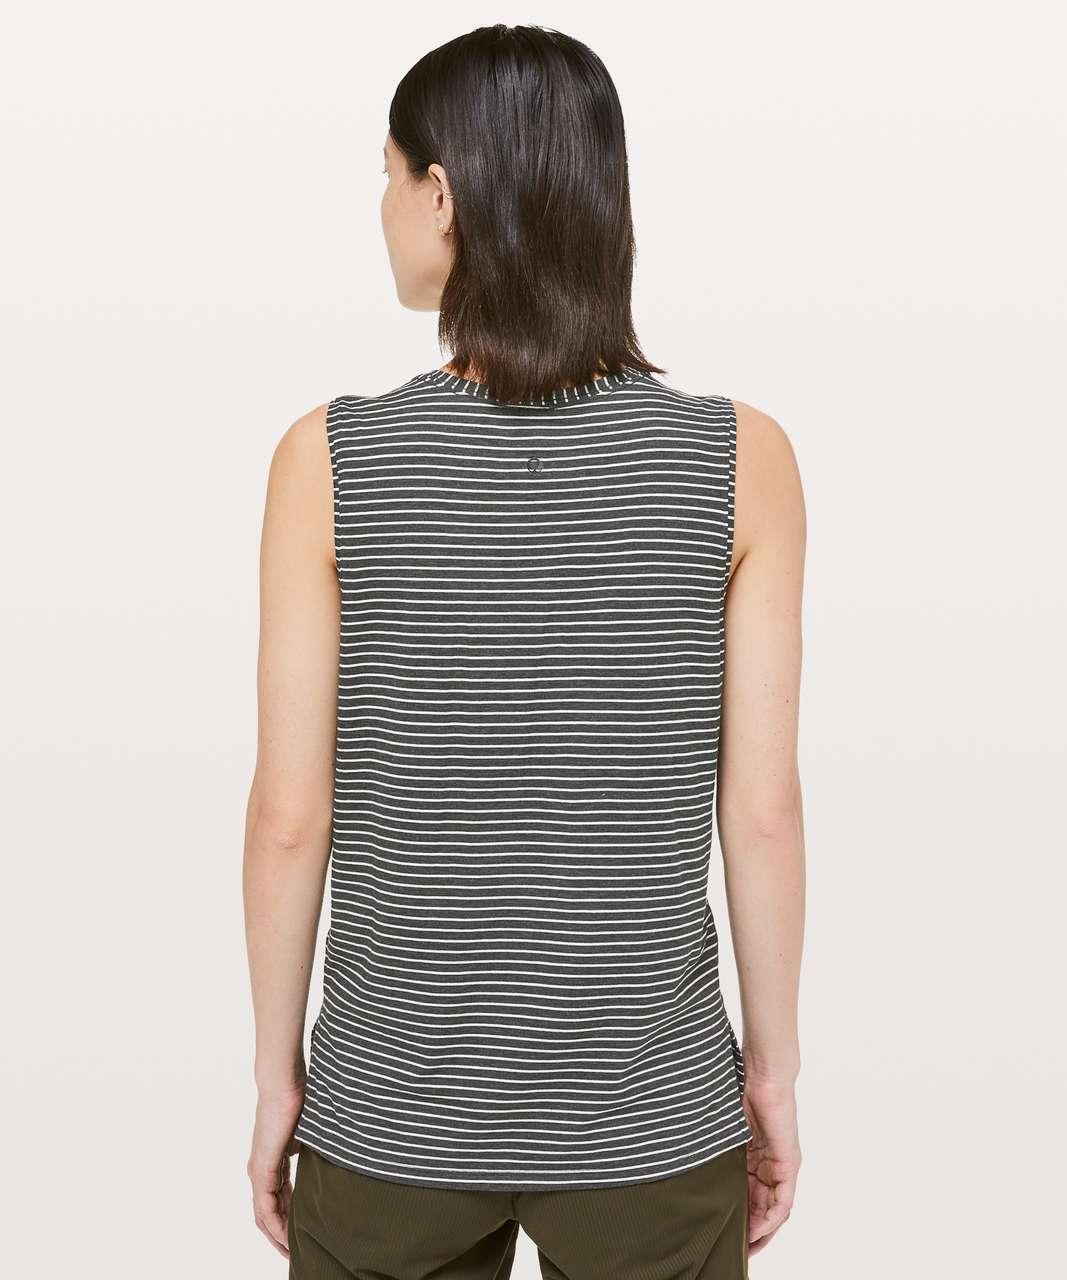 Lululemon Love Sleeveless Tank - Modern Stripe Heathered Black White